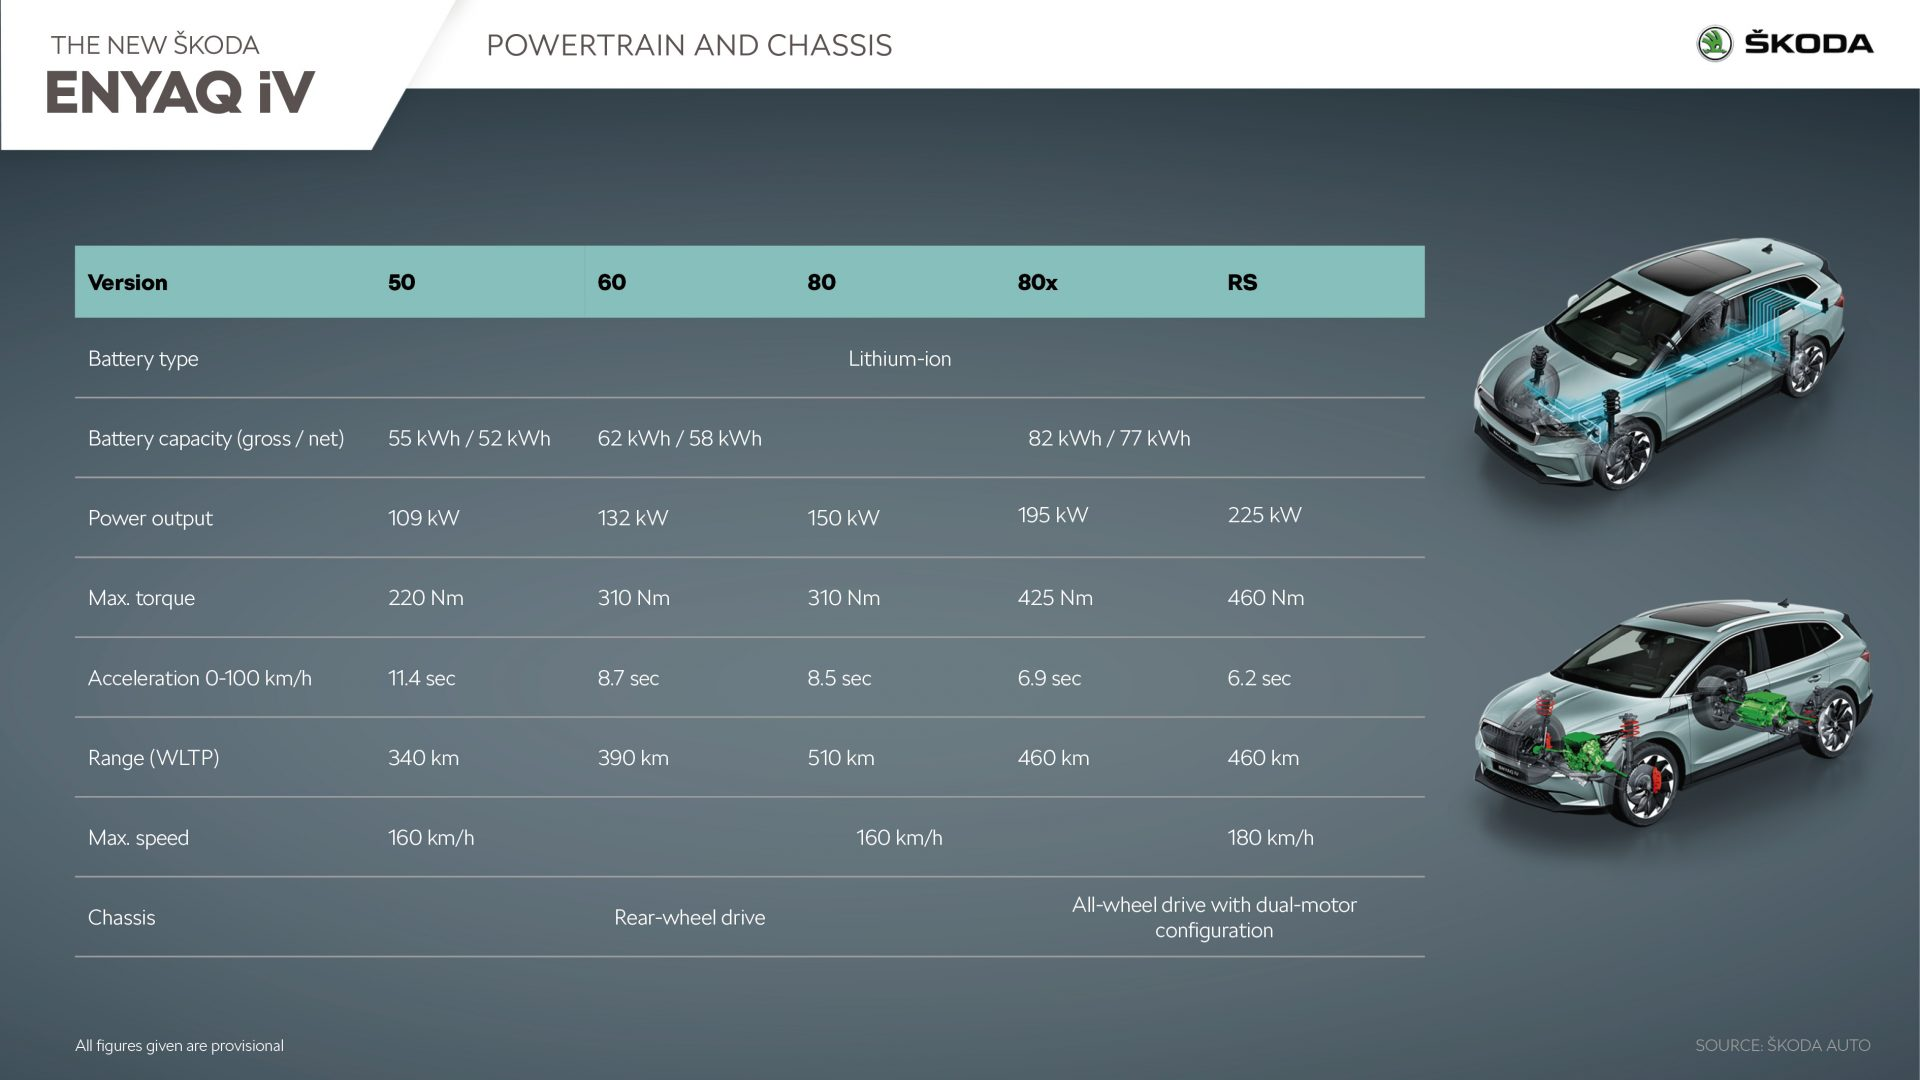 ENYAQ_iV_EN_Powertrain_and_Chassis-1920x1080.jpg